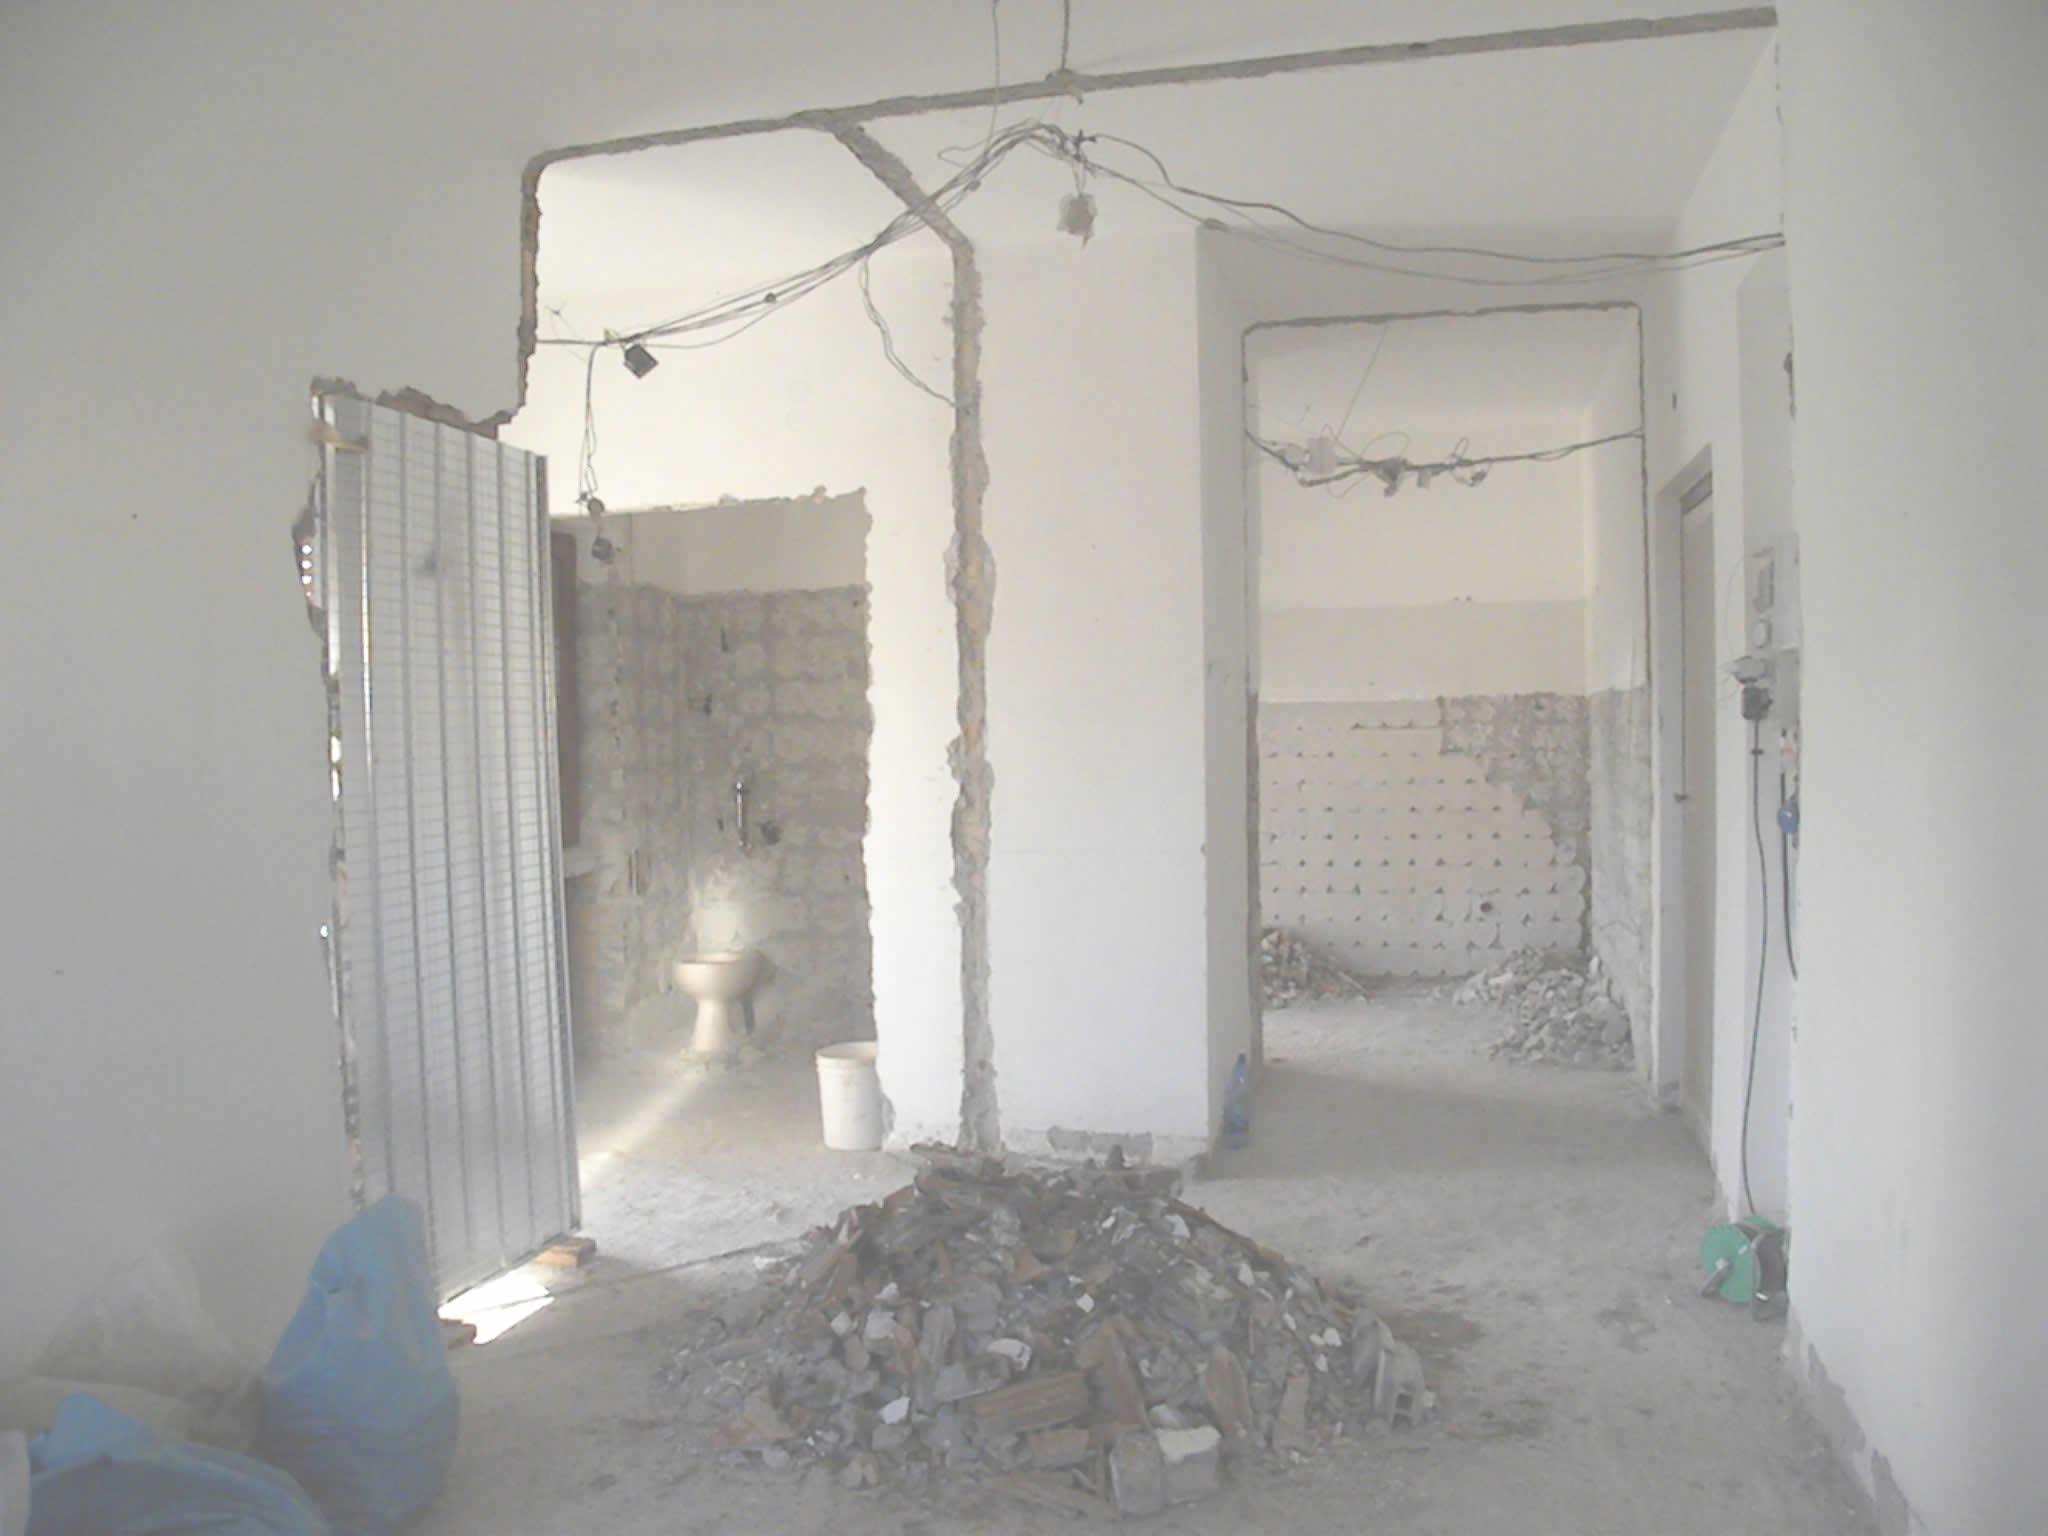 Lavori di ristrutturazione casa costi ebooksit for Software ristrutturazione casa